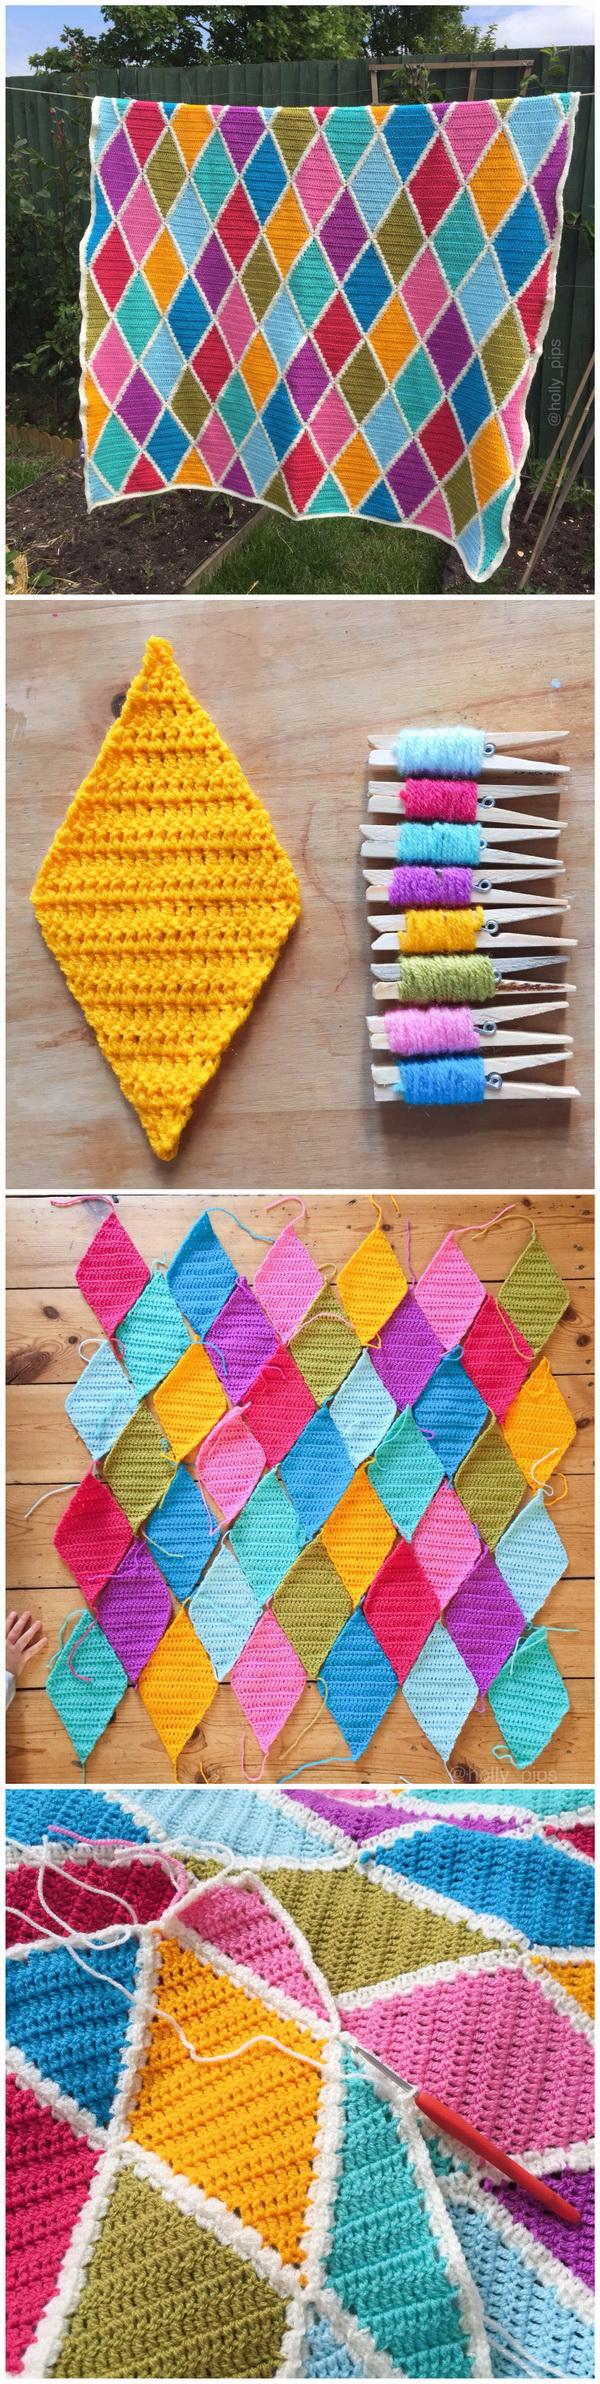 Quick And Easy Crochet Blanket Patterns For Beginners: Summer Harlequin Blanket.